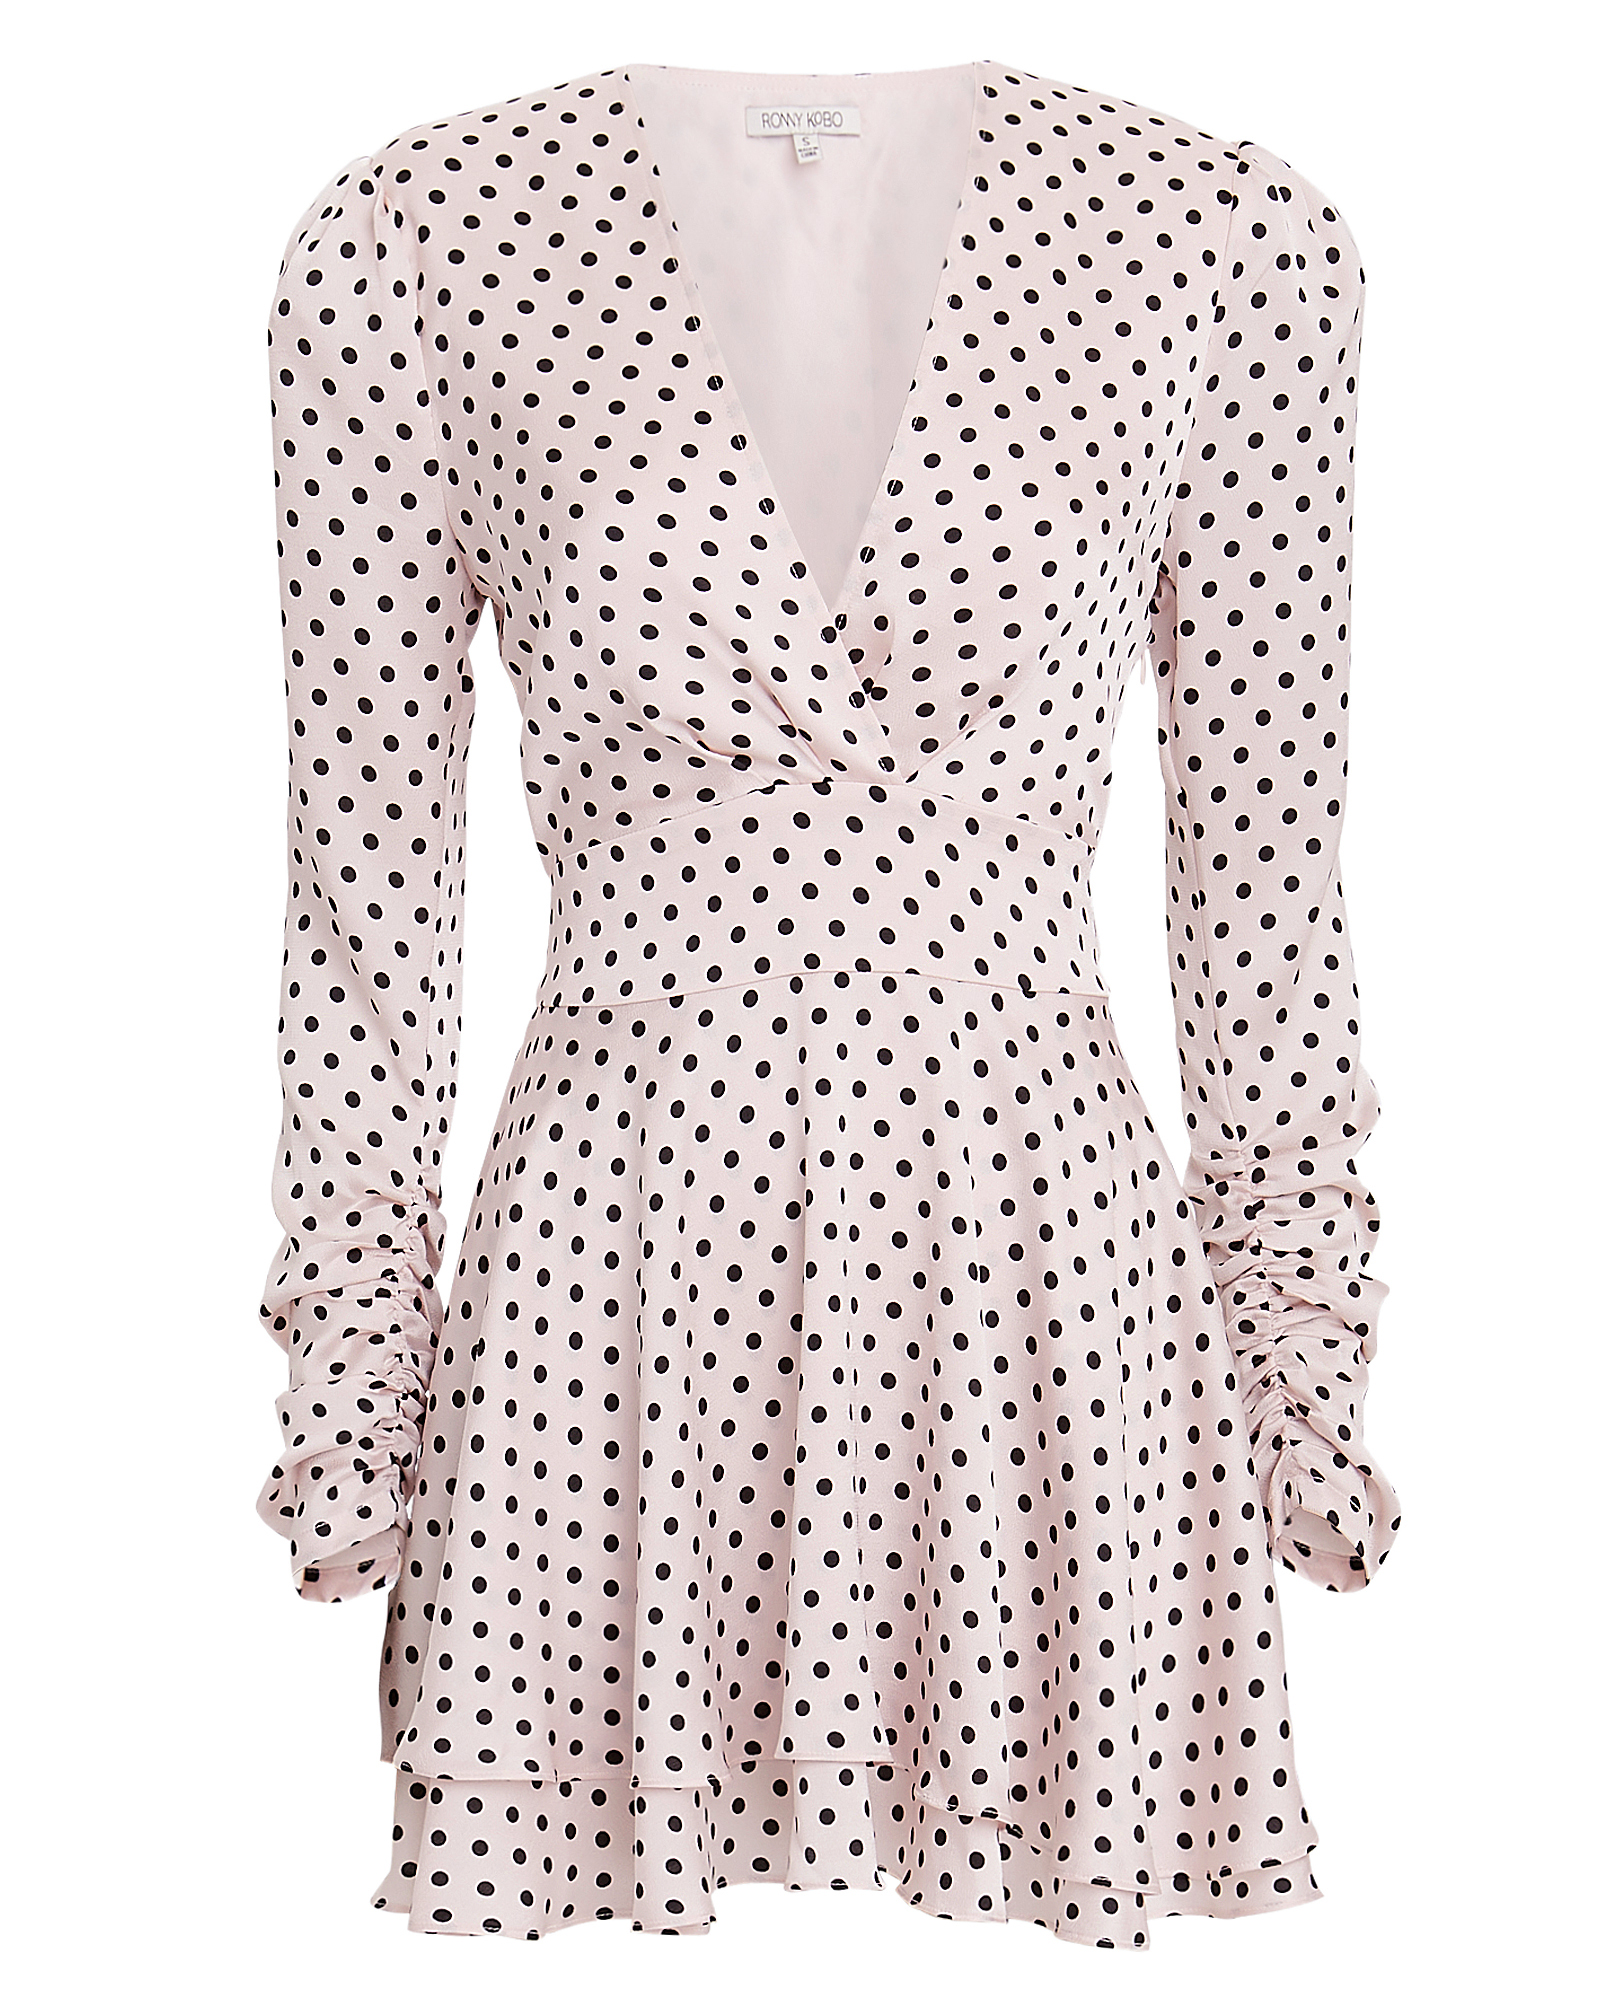 TORN Ronny Kobo Kallow Polka Dot Mini Dress Pink/Black